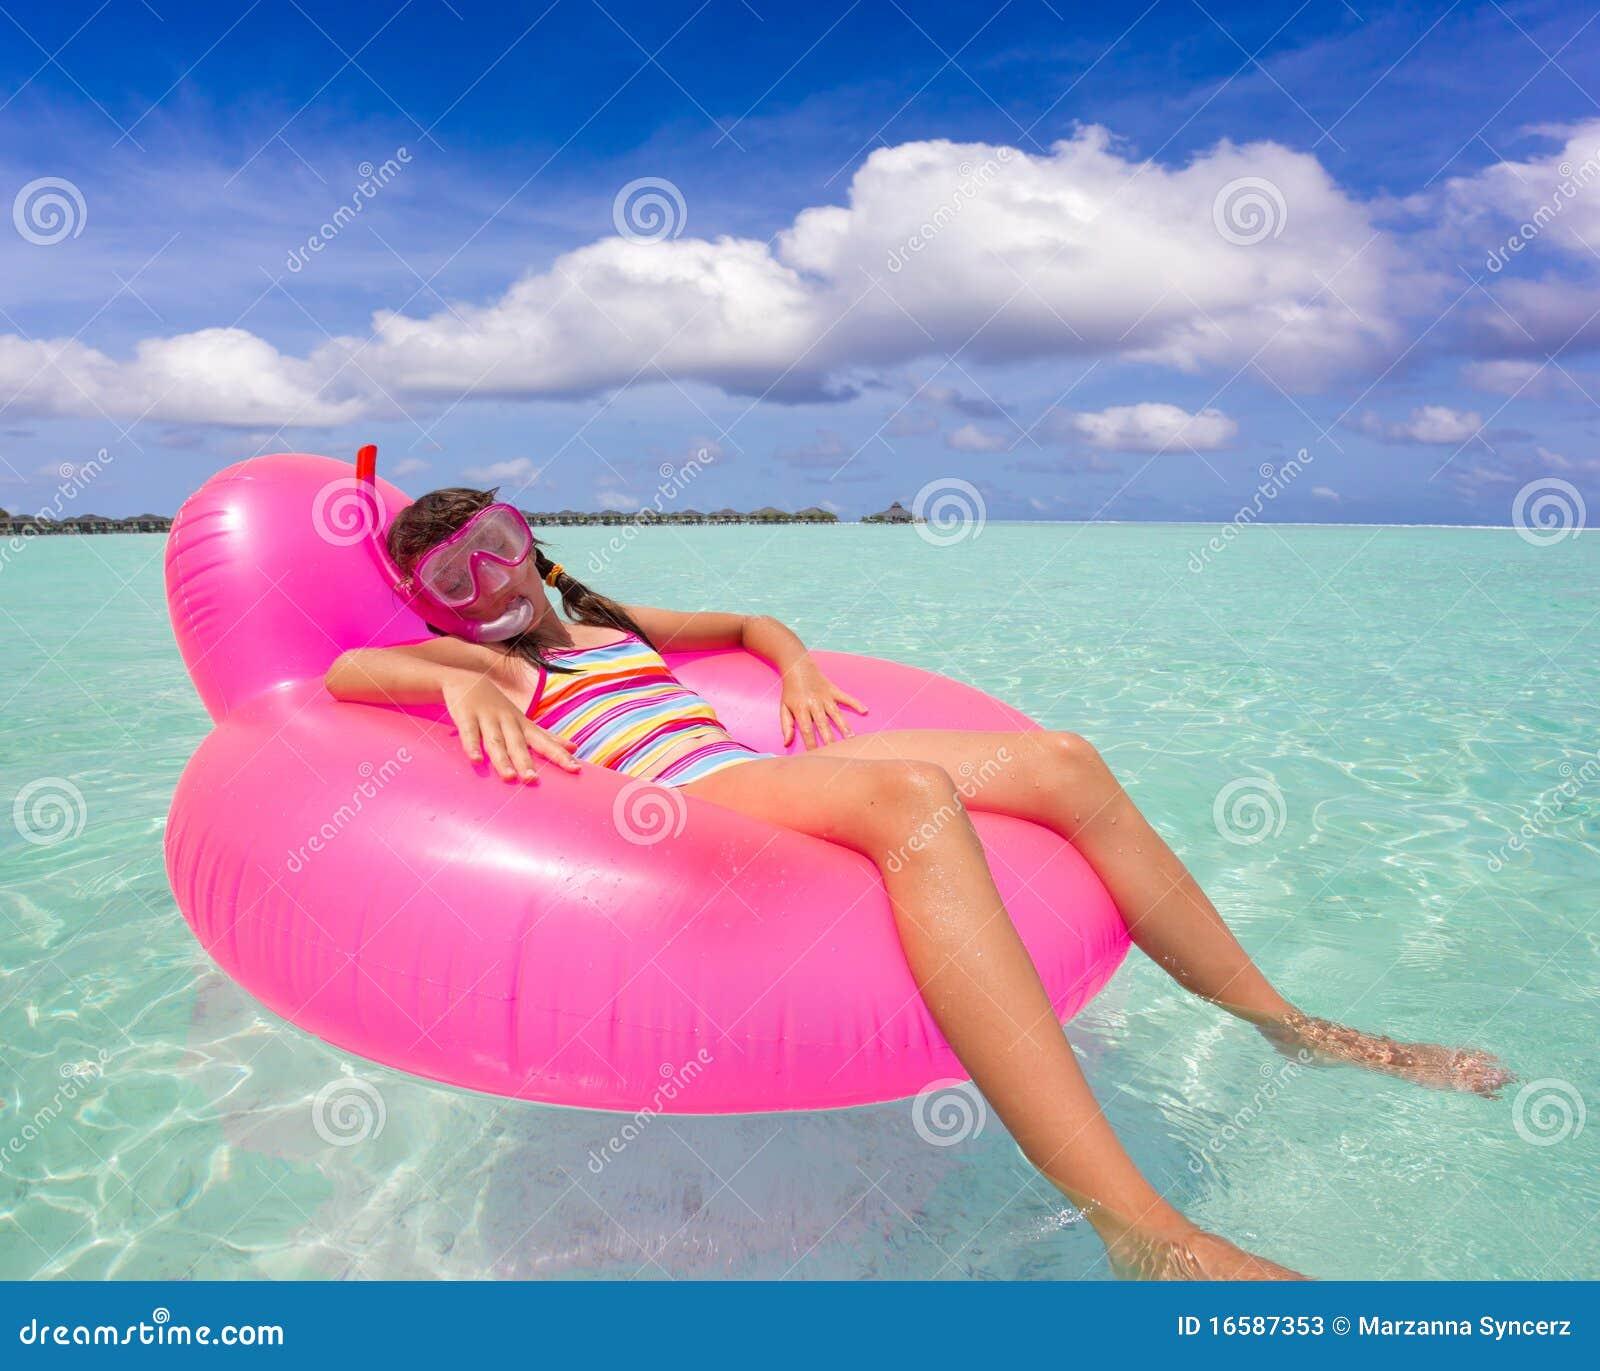 Girl On Air Mattress In Sea Stock Photos Image 16587353